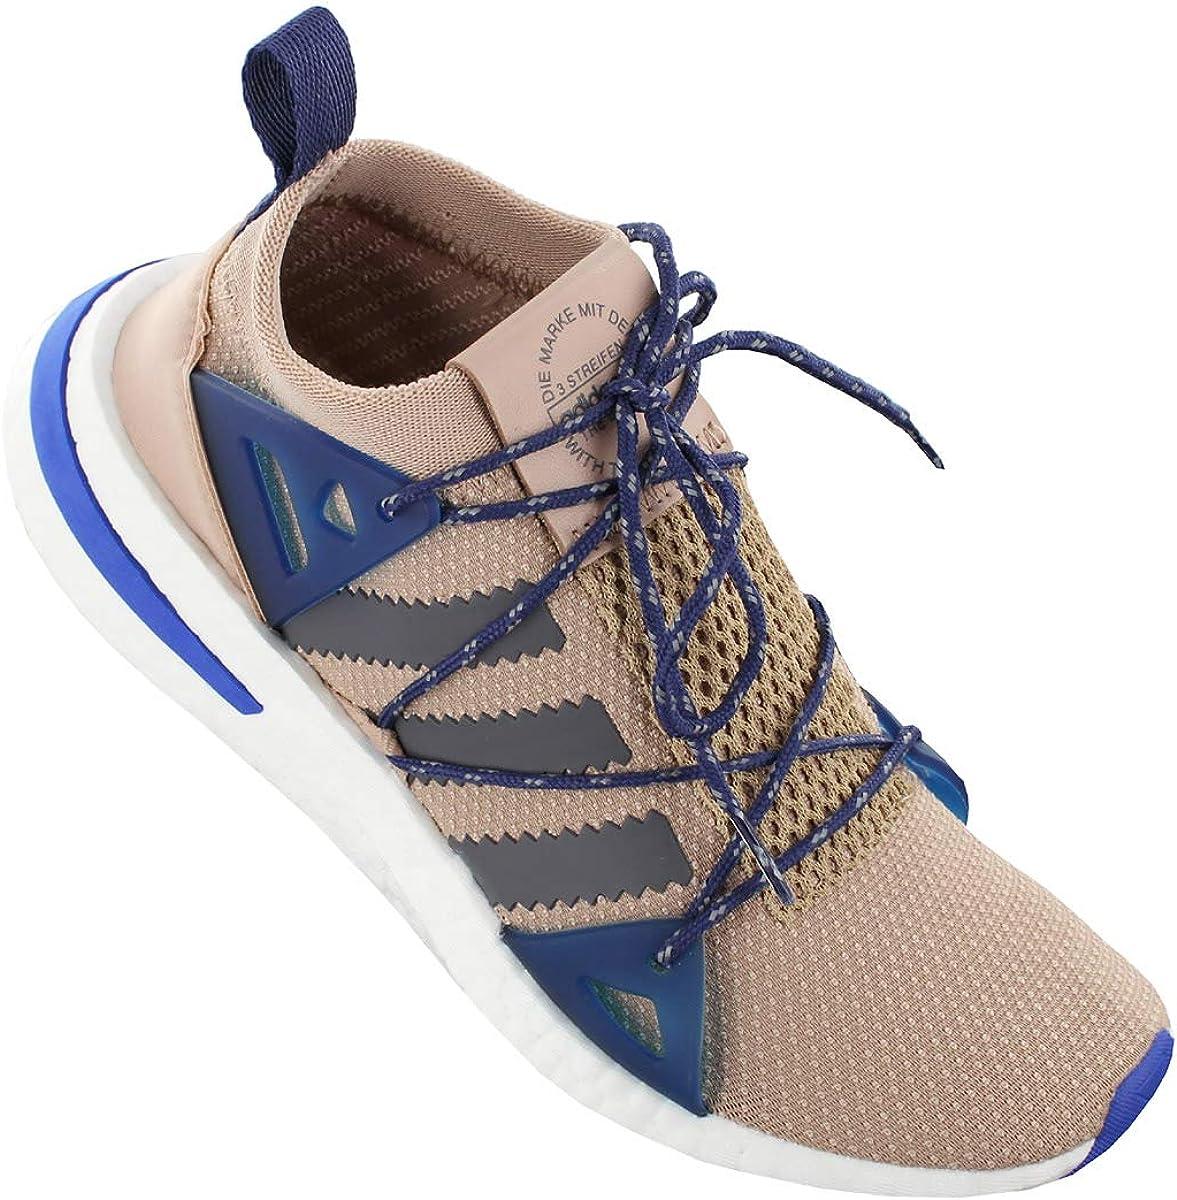 Adidas Originals Arkyn W Chaussures de Femme Beige Chaussures Femme Sneaker Baskets Multicolore